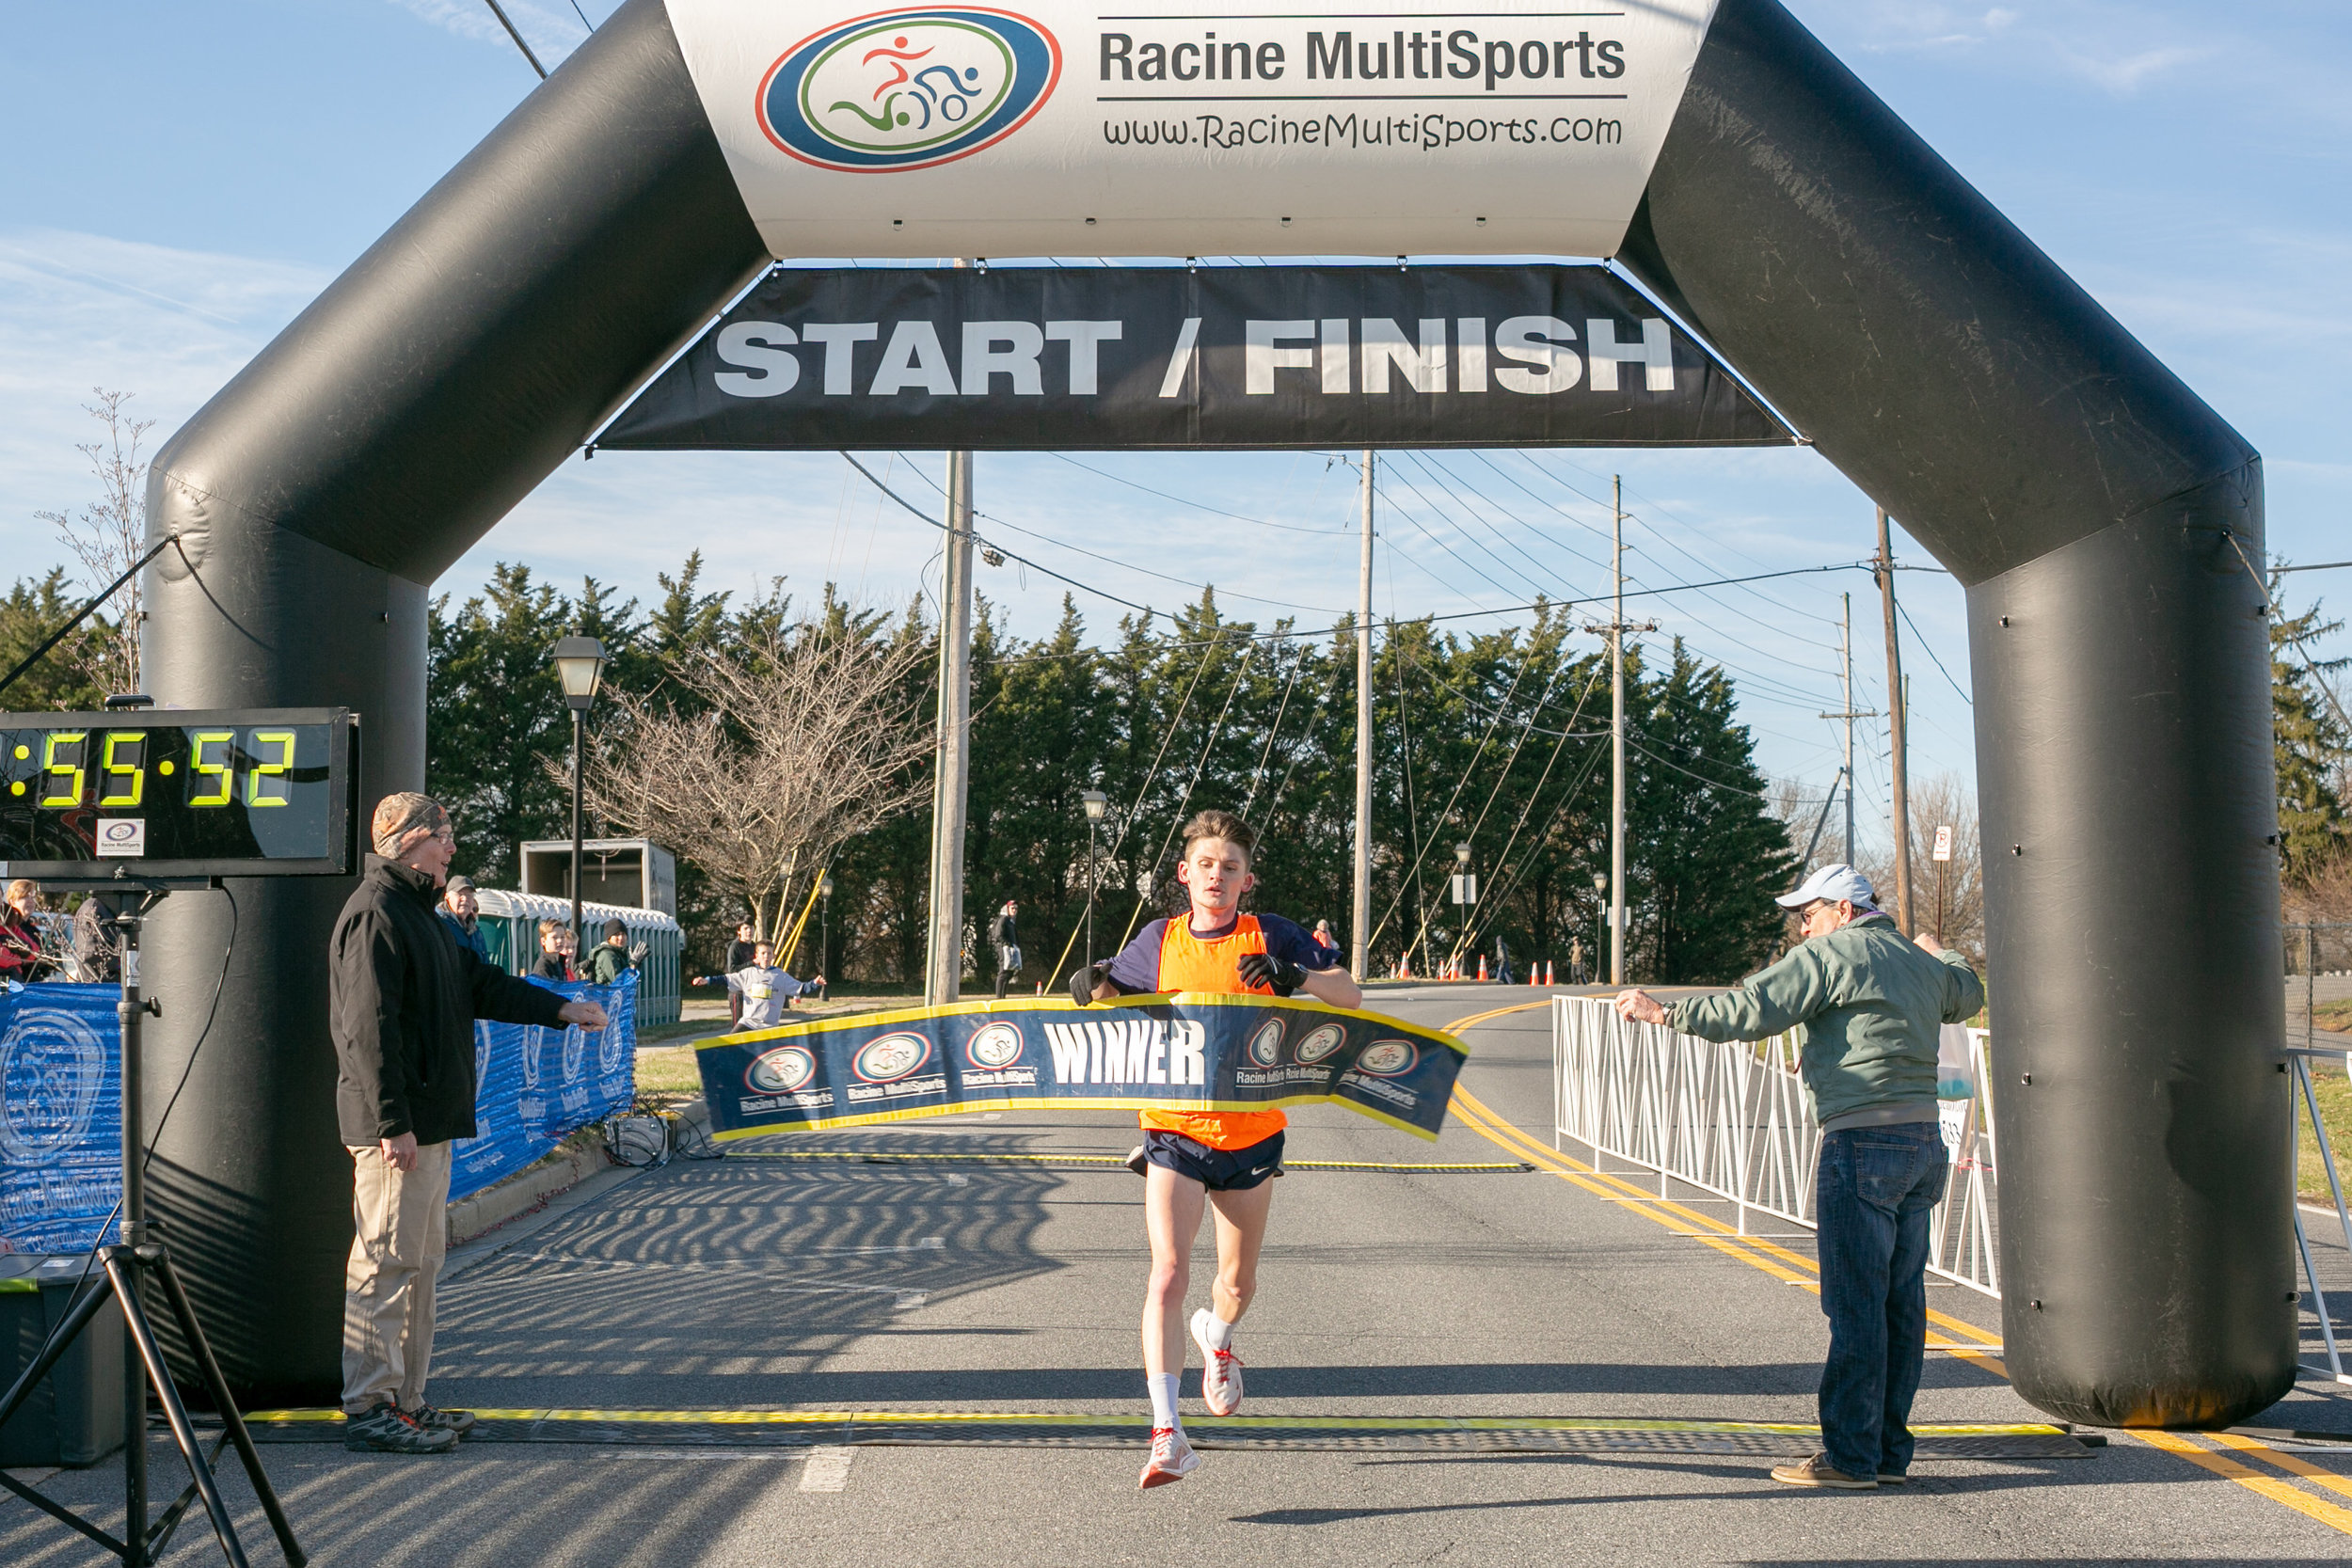 Congratulations to overall 2019 Mission 10 Miler Winner Scott Baker  55:50